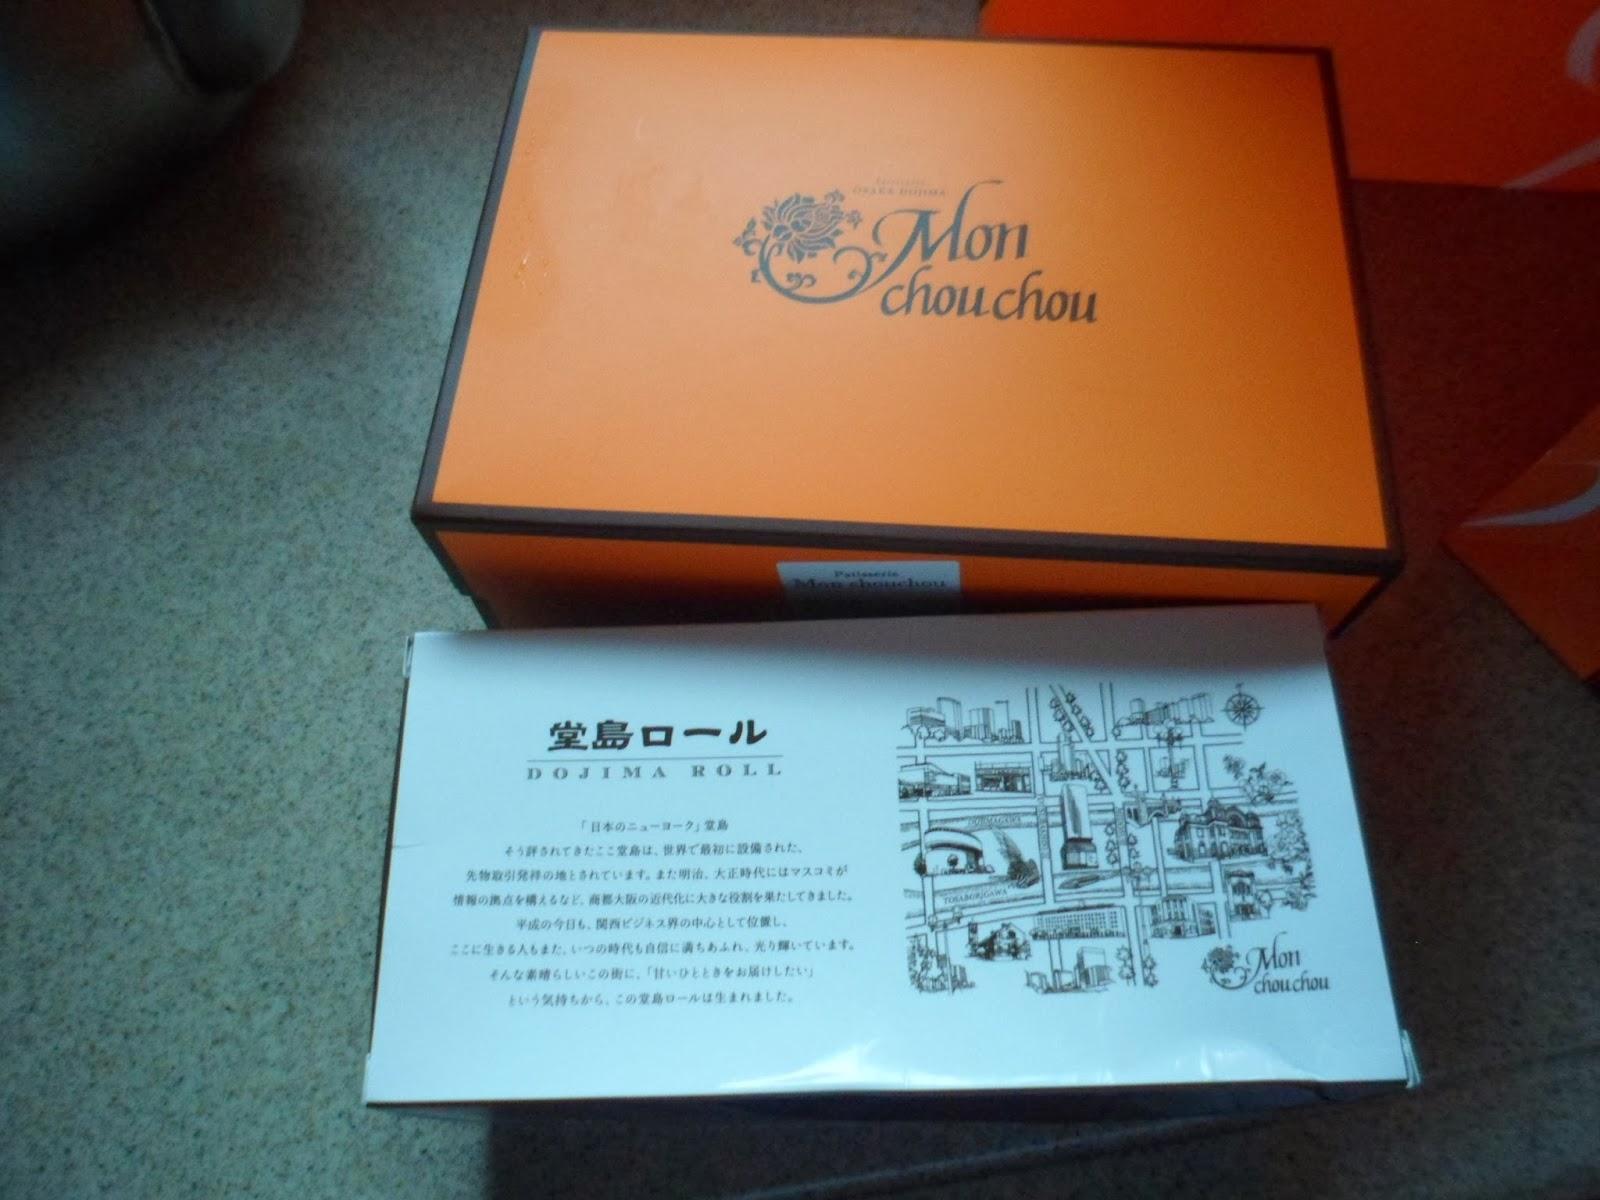 Dojima roll\'s sensational launch in Seoul - Mon Chouchou (Mon Cher ...